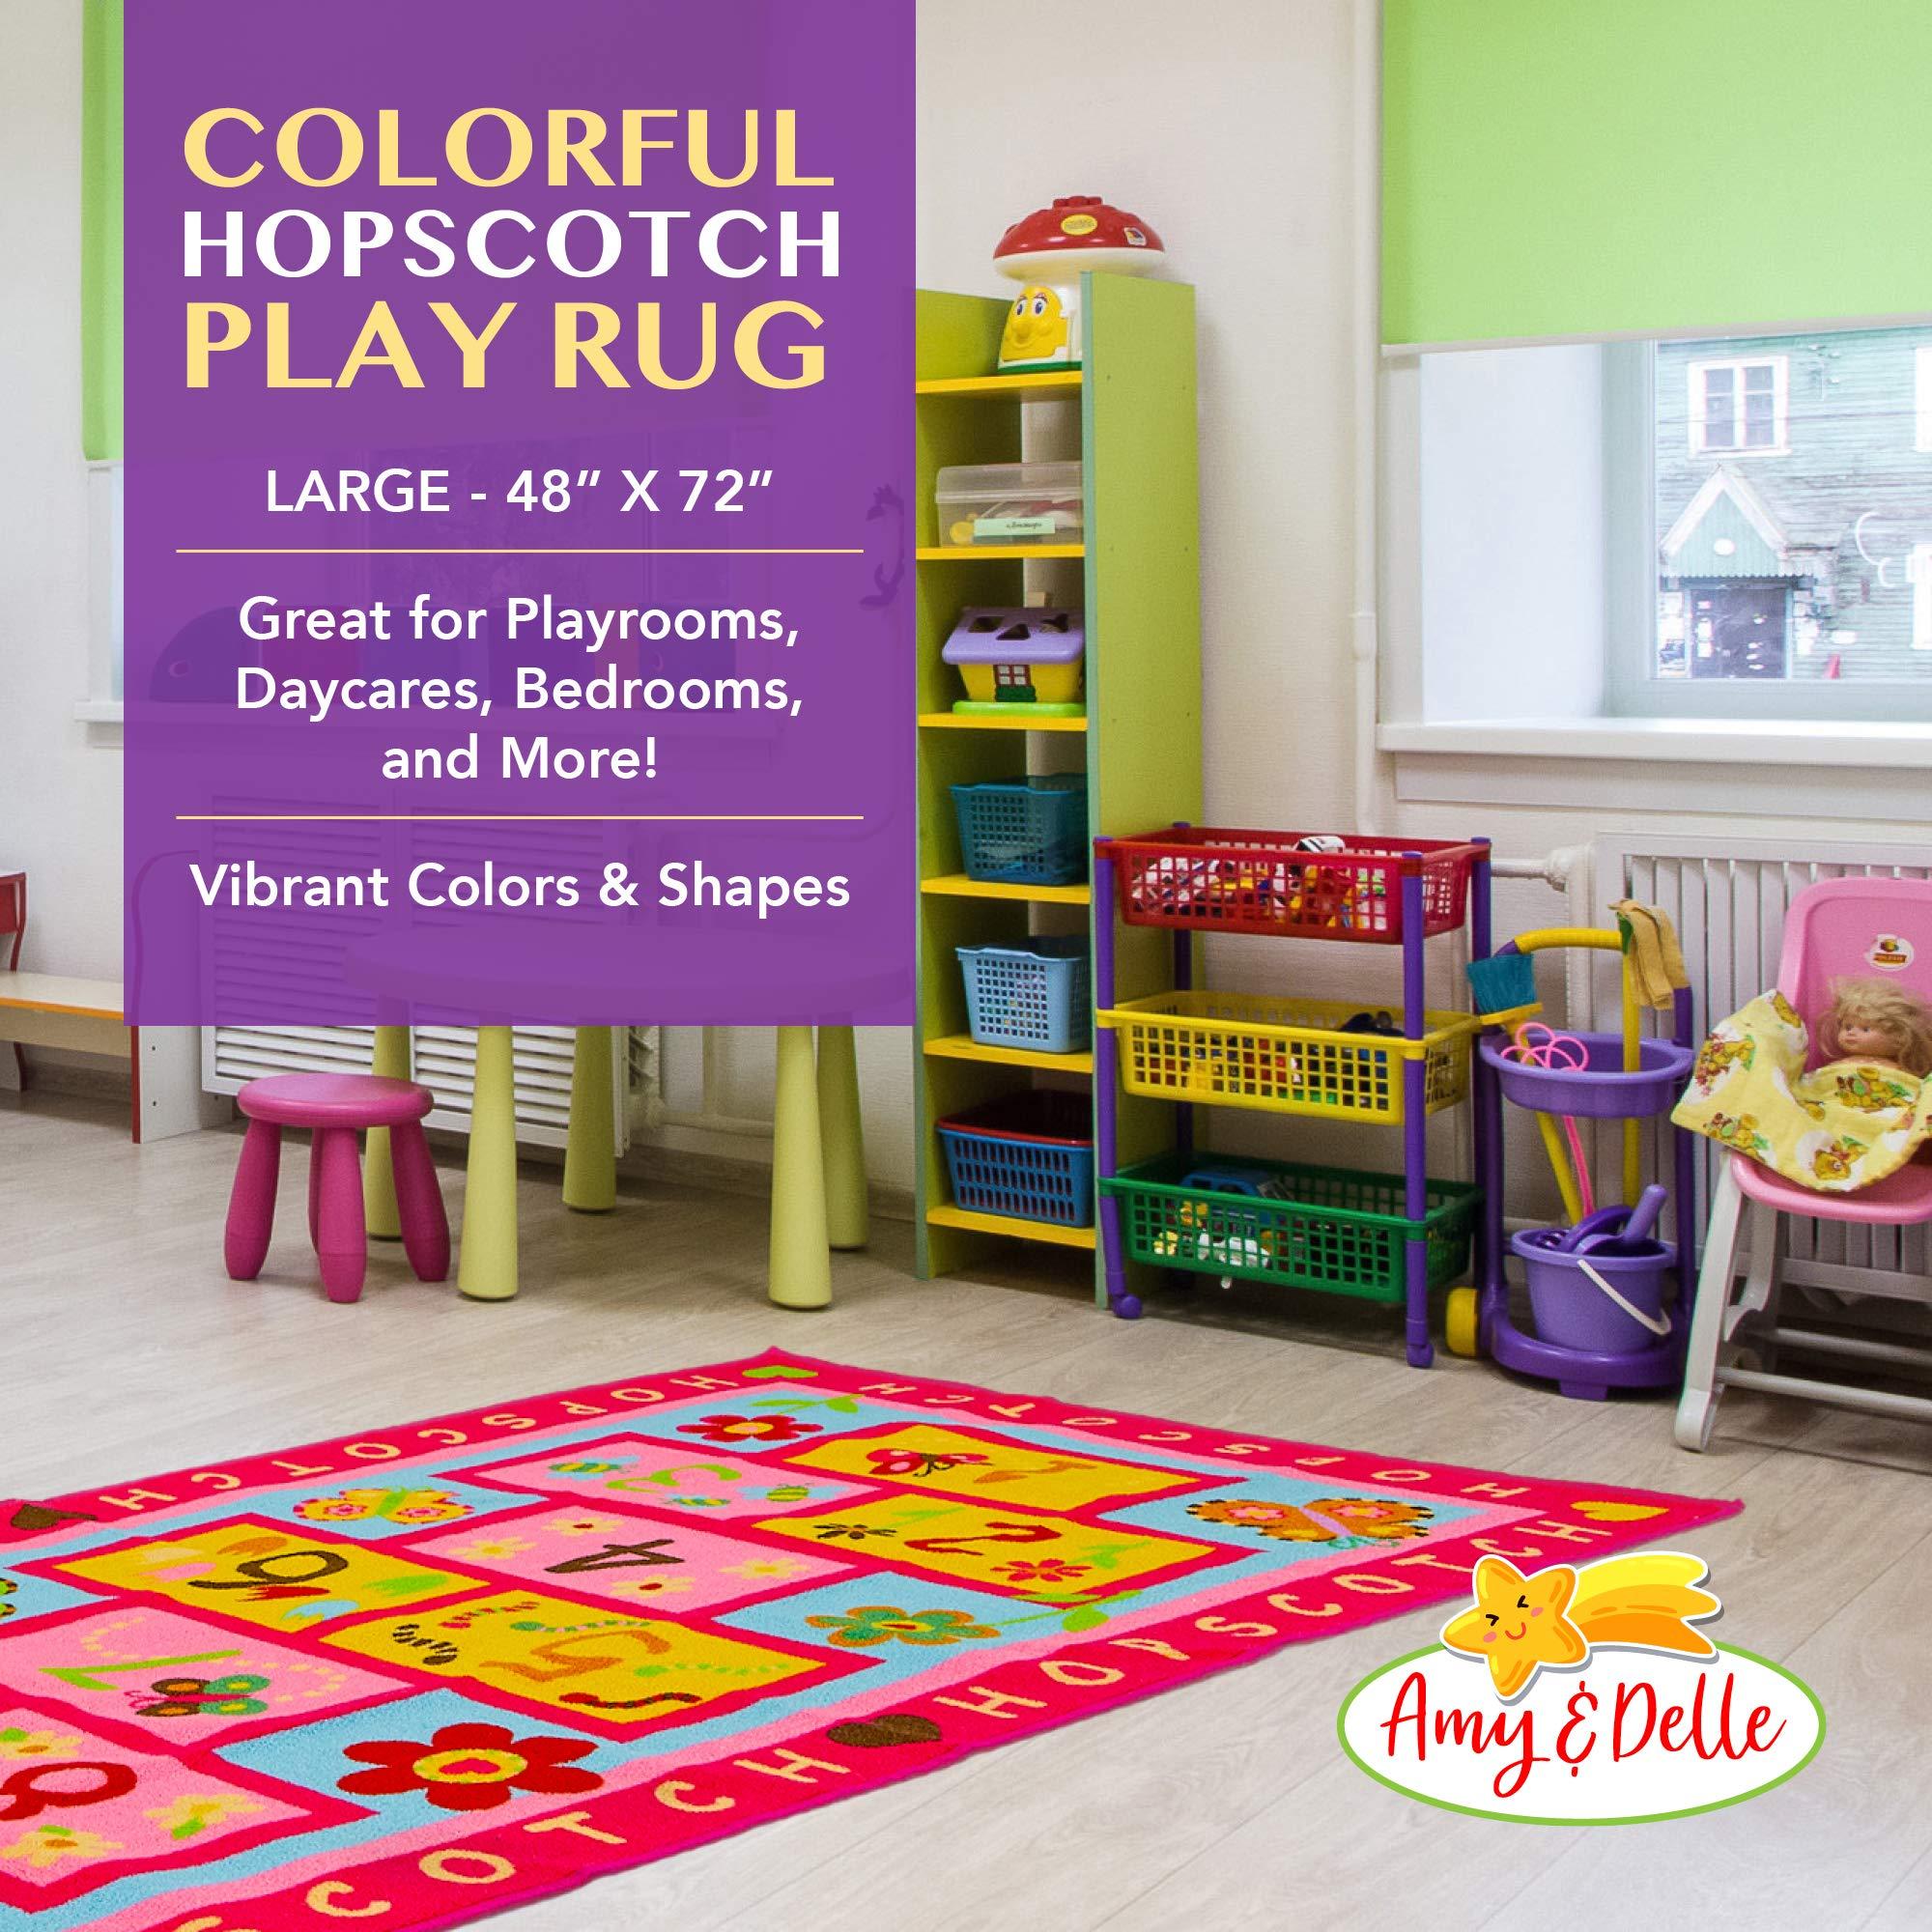 Hopscotch Rug Play Space /& Room Decor Floor Rug Carpet Nursery Classroom Sturdy Gift For Girls /& Boys Kid/'s Floor Play Mat for Bedroom